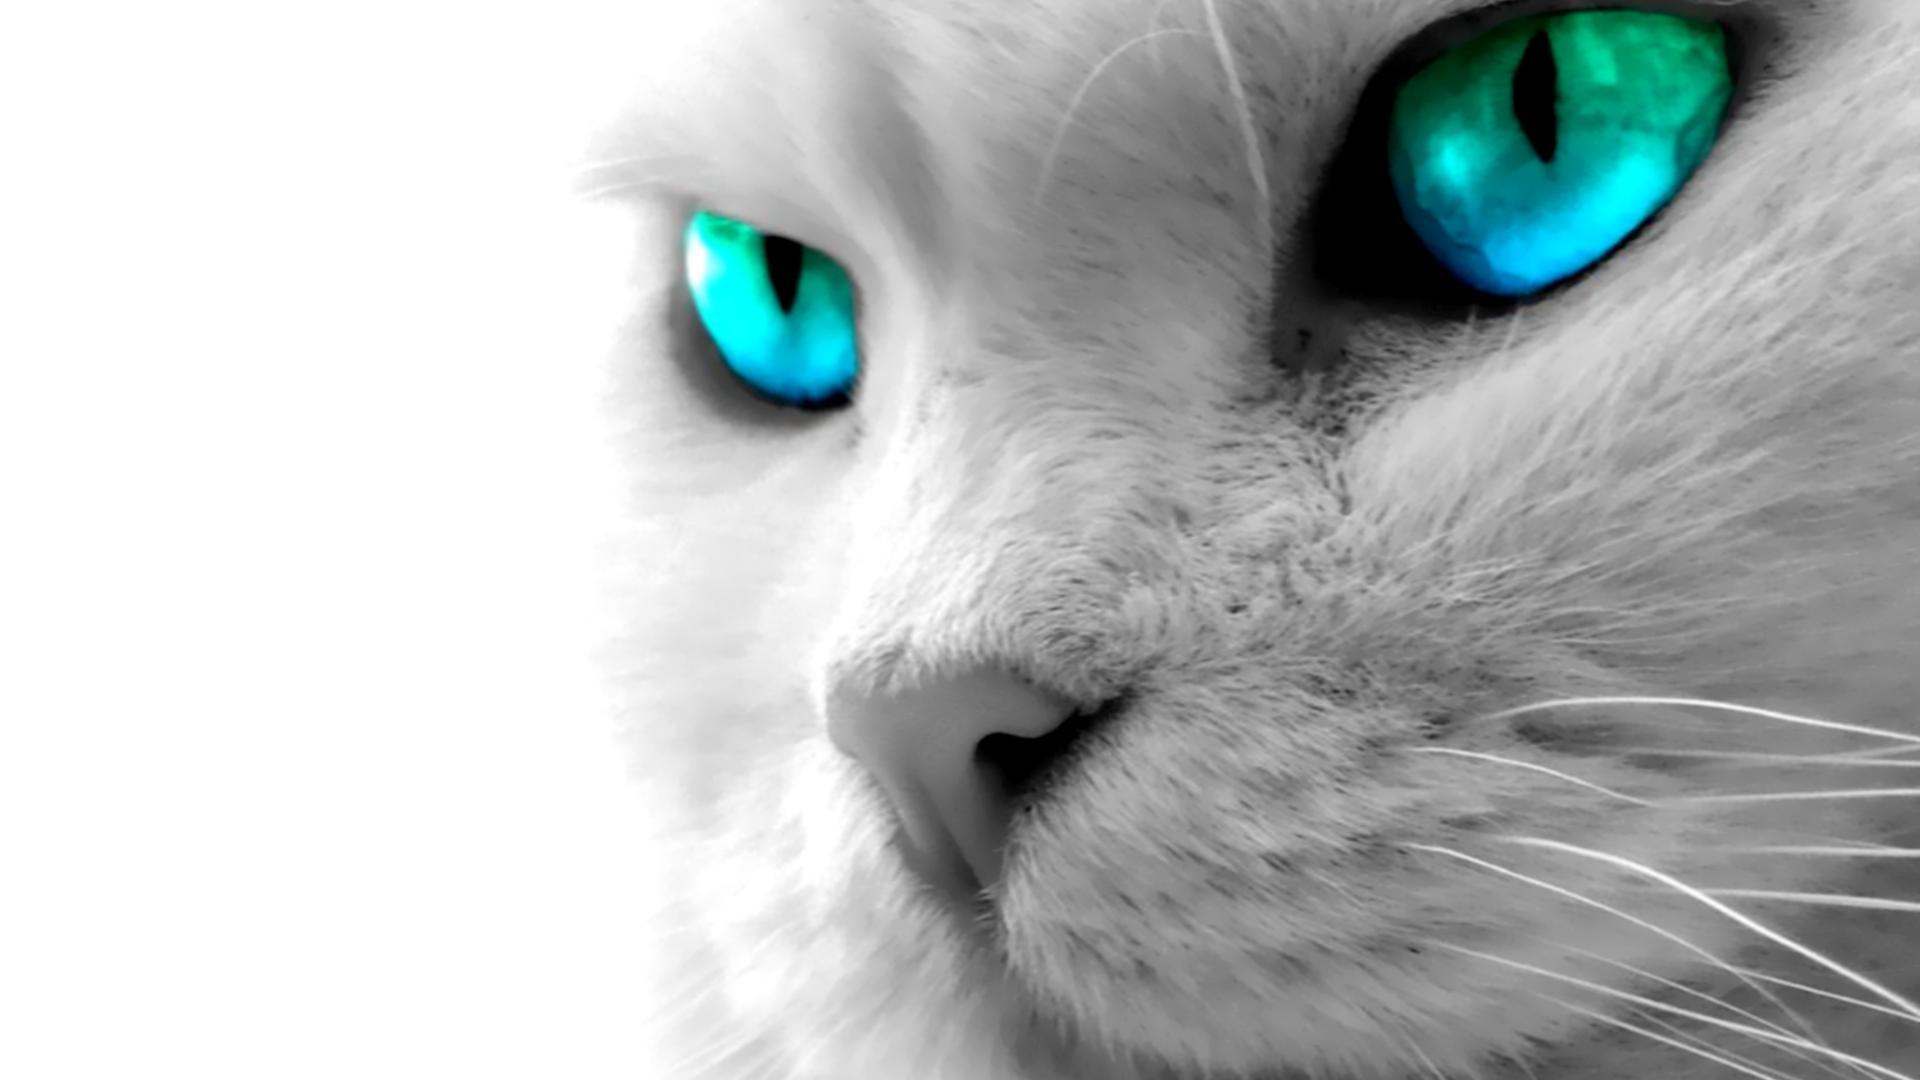 Cat Blue Eyes High Definition Wallpaper 1920x1080 Full HD Wallpapers 1920x1080